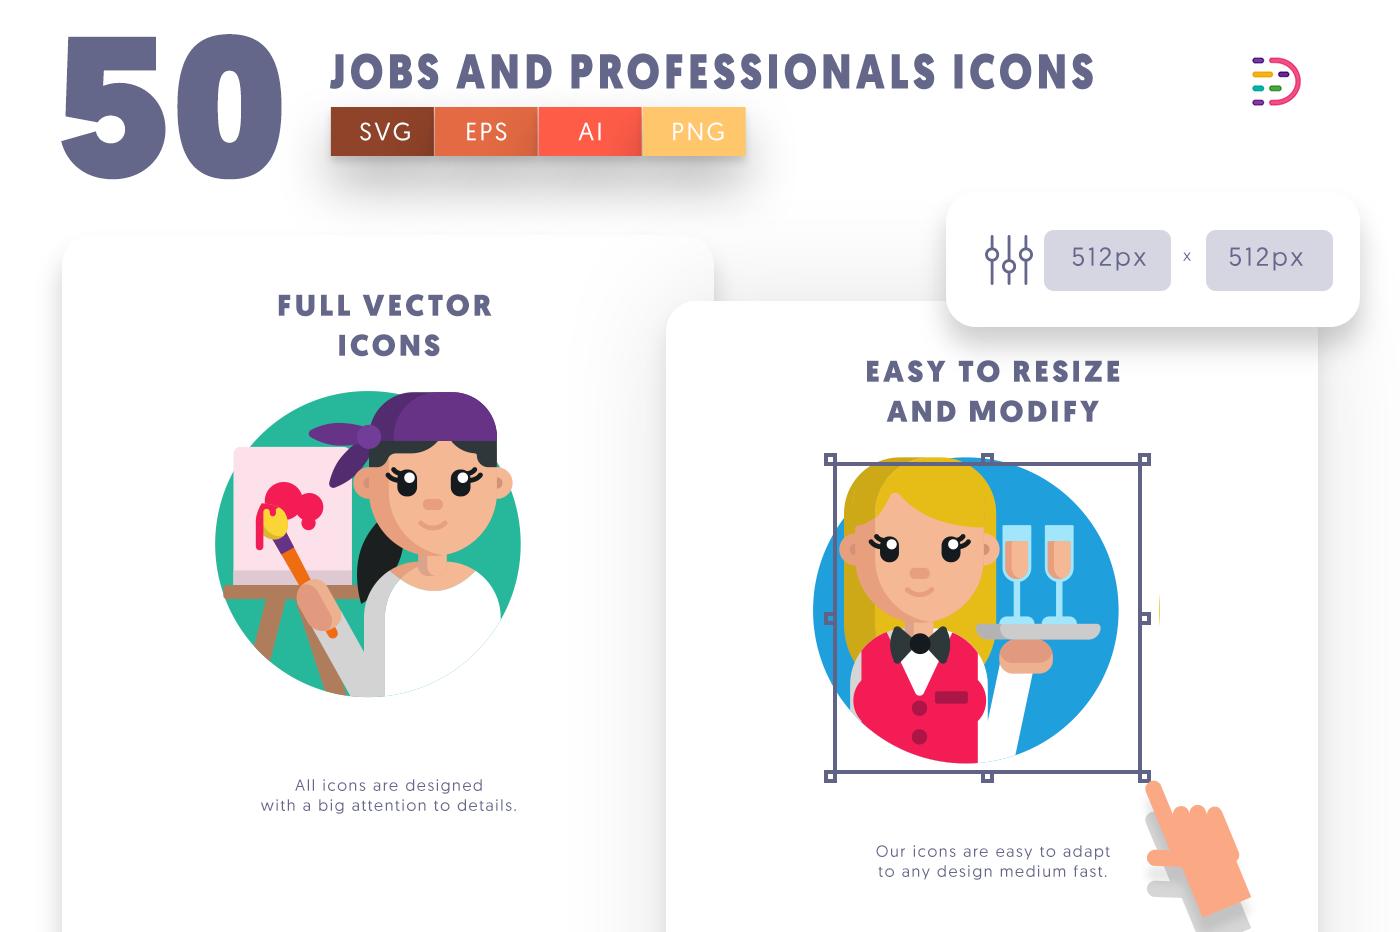 Full vector 50JobandProfessionals Icons